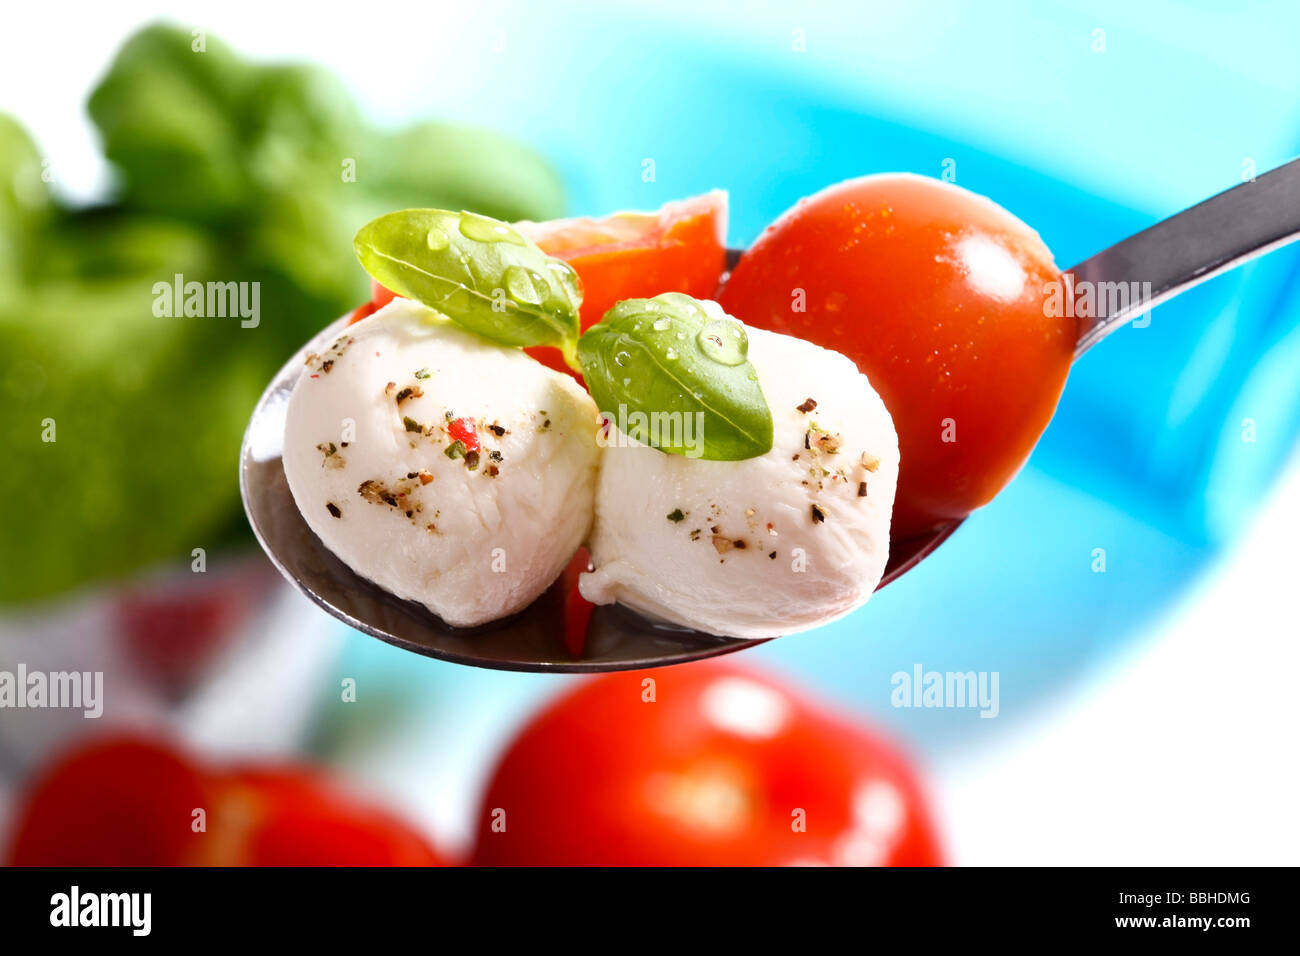 Tomatoes, mozzarella and basil on a spoon Stock Photo